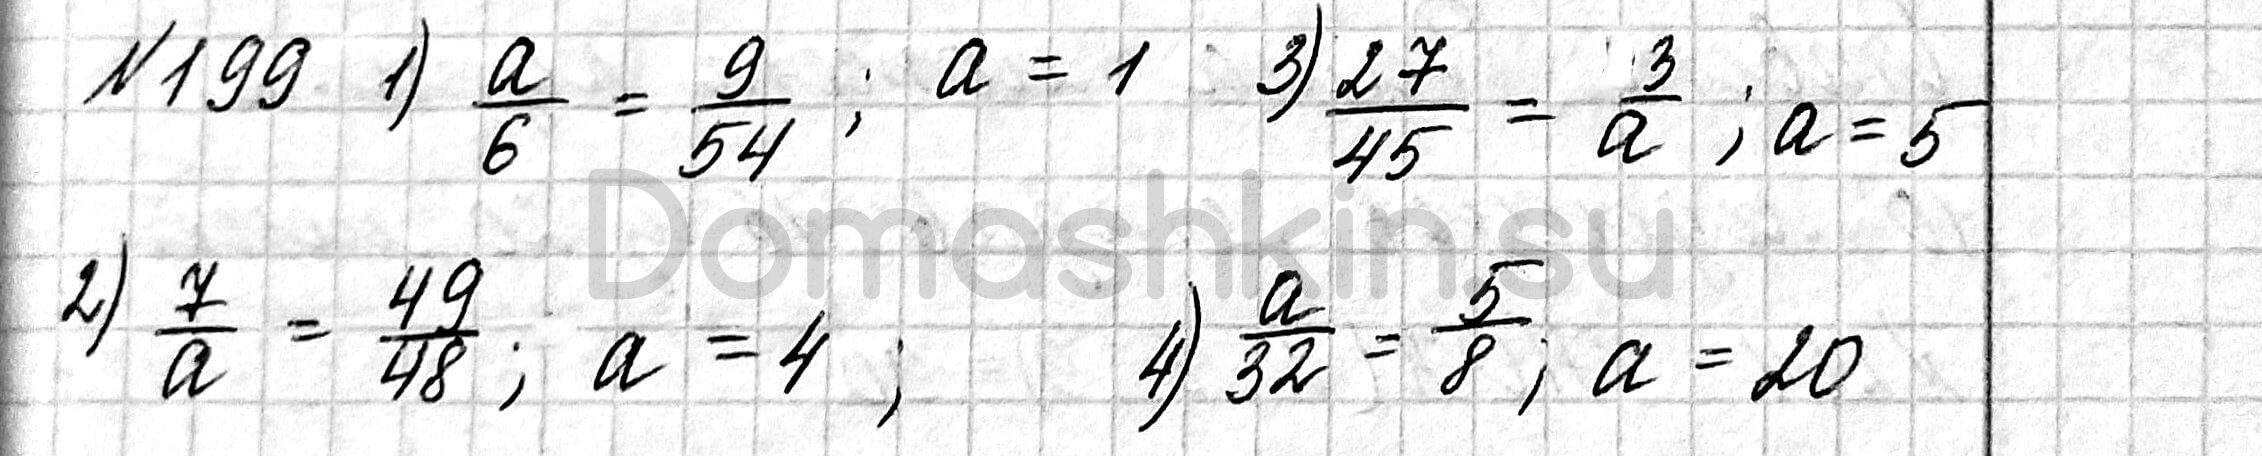 Математика 6 класс учебник Мерзляк номер 199 решение